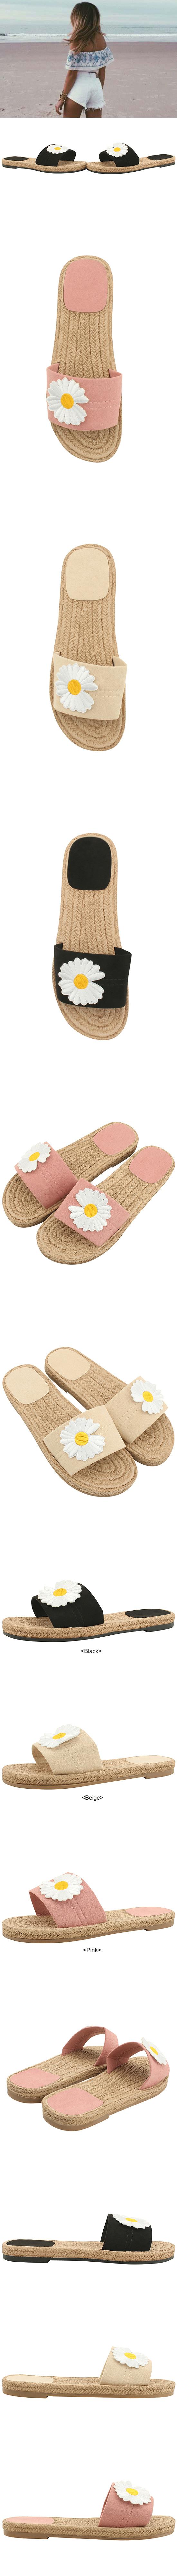 Dandelion flower embroidery soft slippers beige